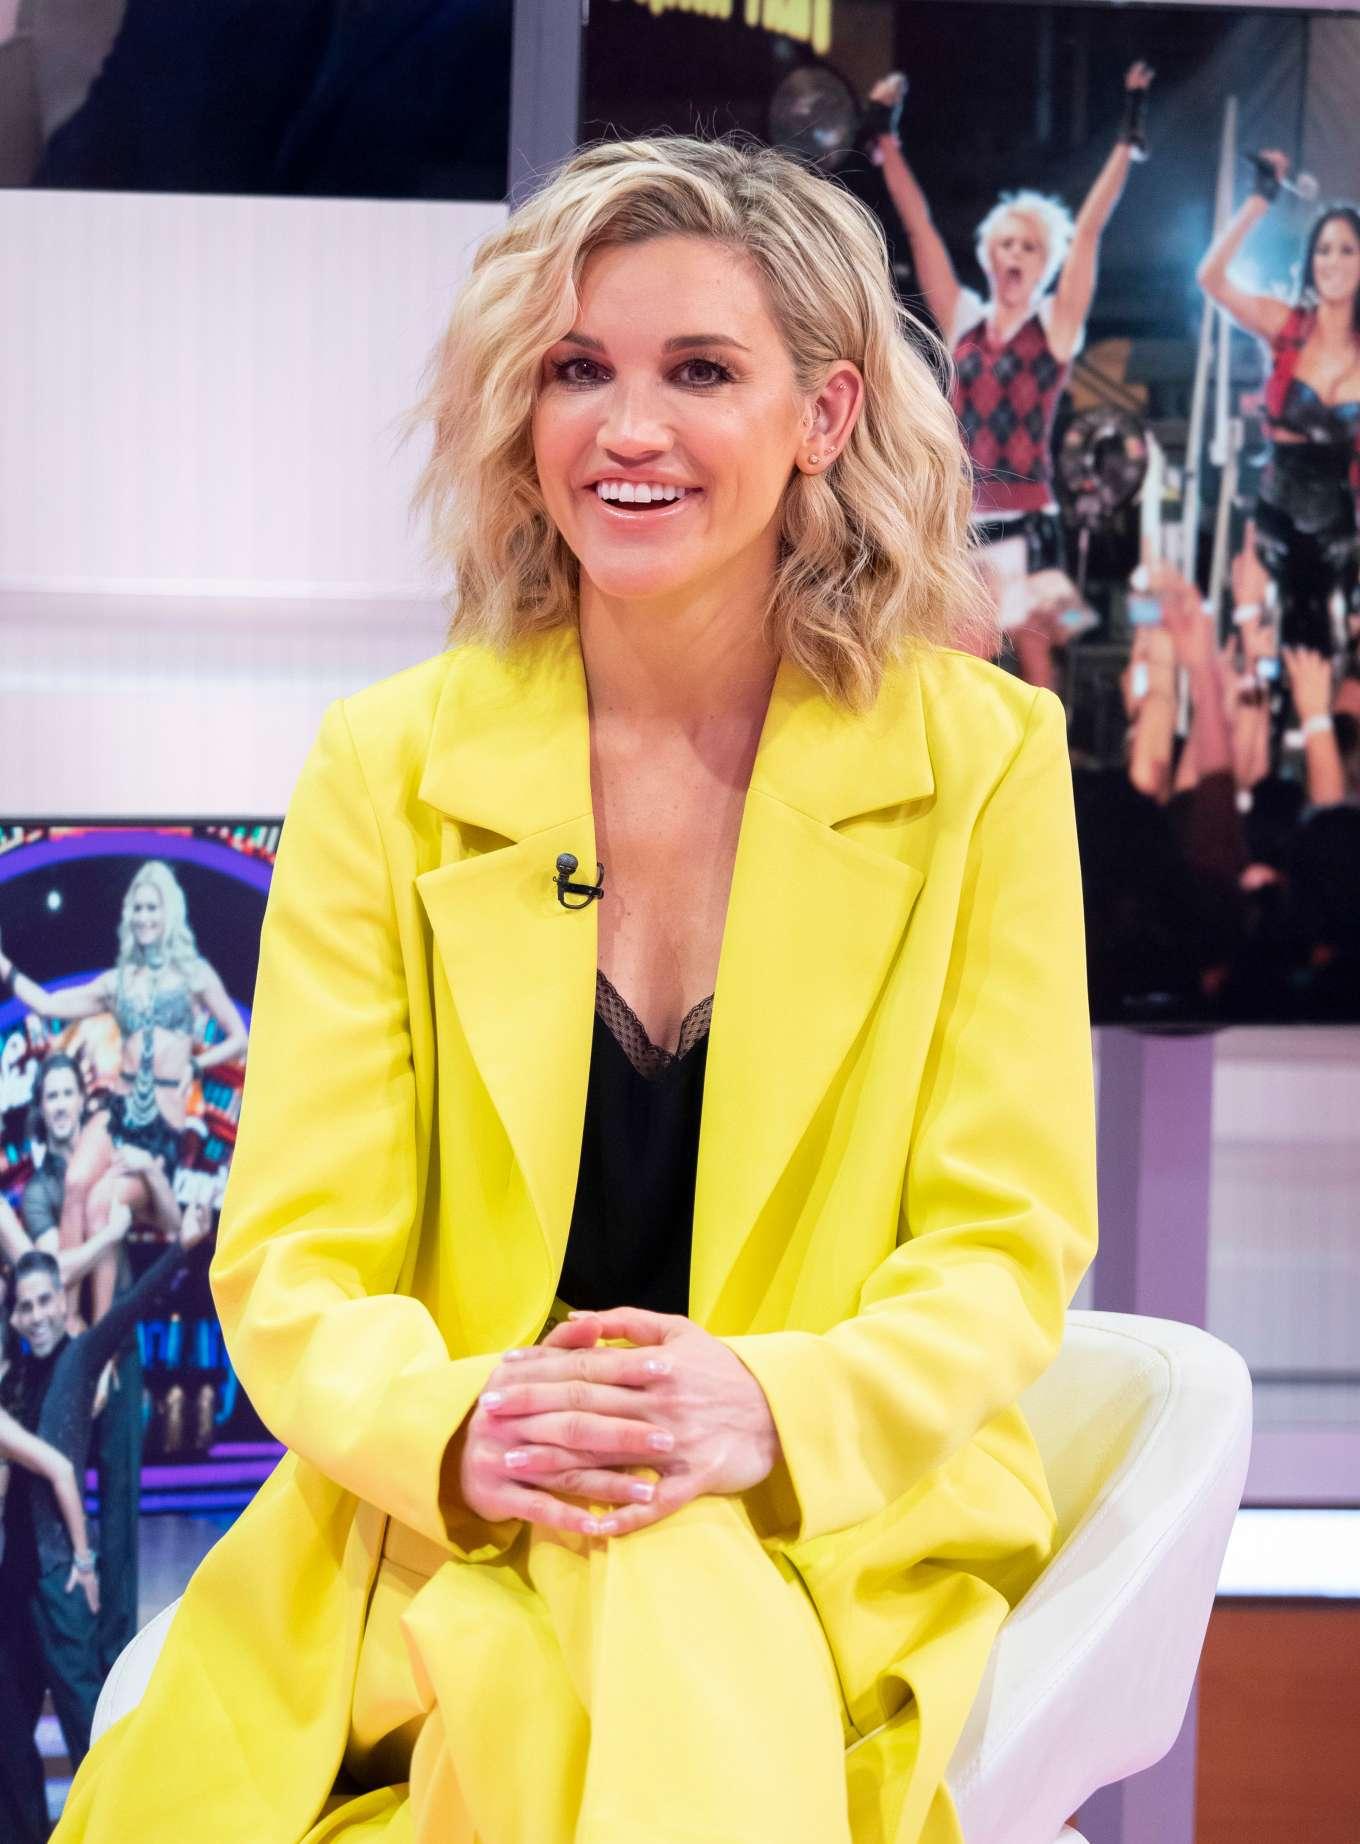 Ashley Roberts - Good Morning Britain TV show in London